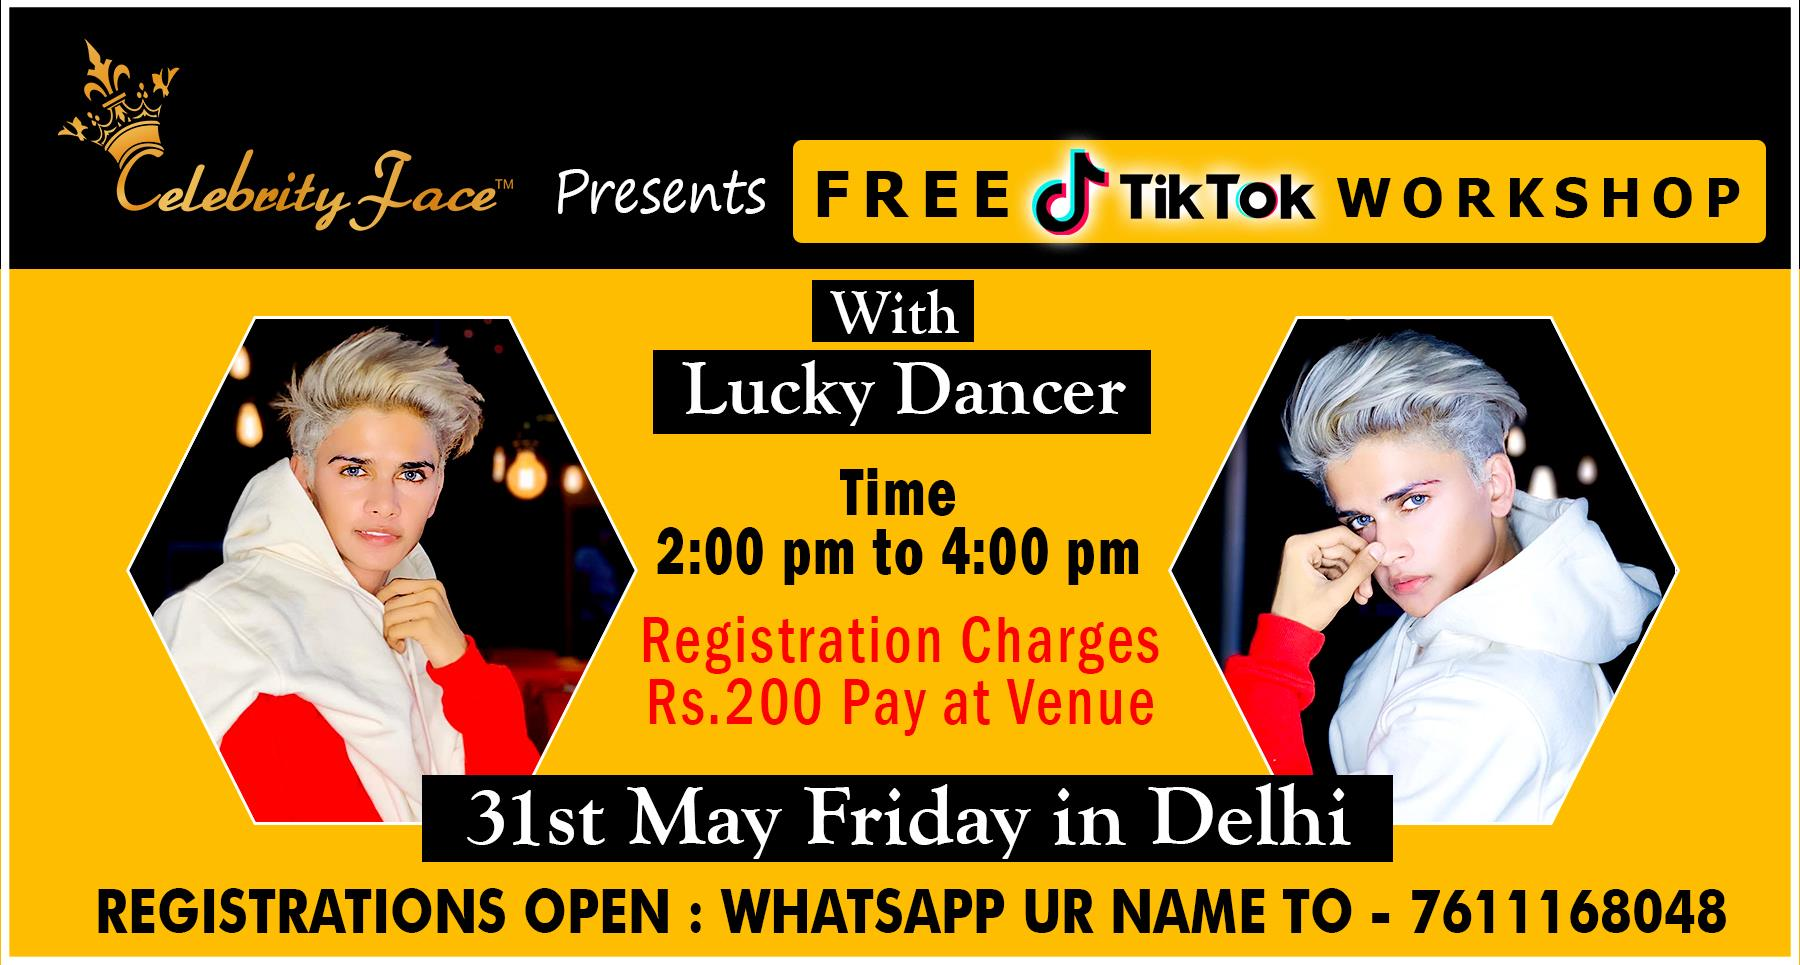 Free TikTok WorkShop with Top TikTok Star Lucky Dancer in